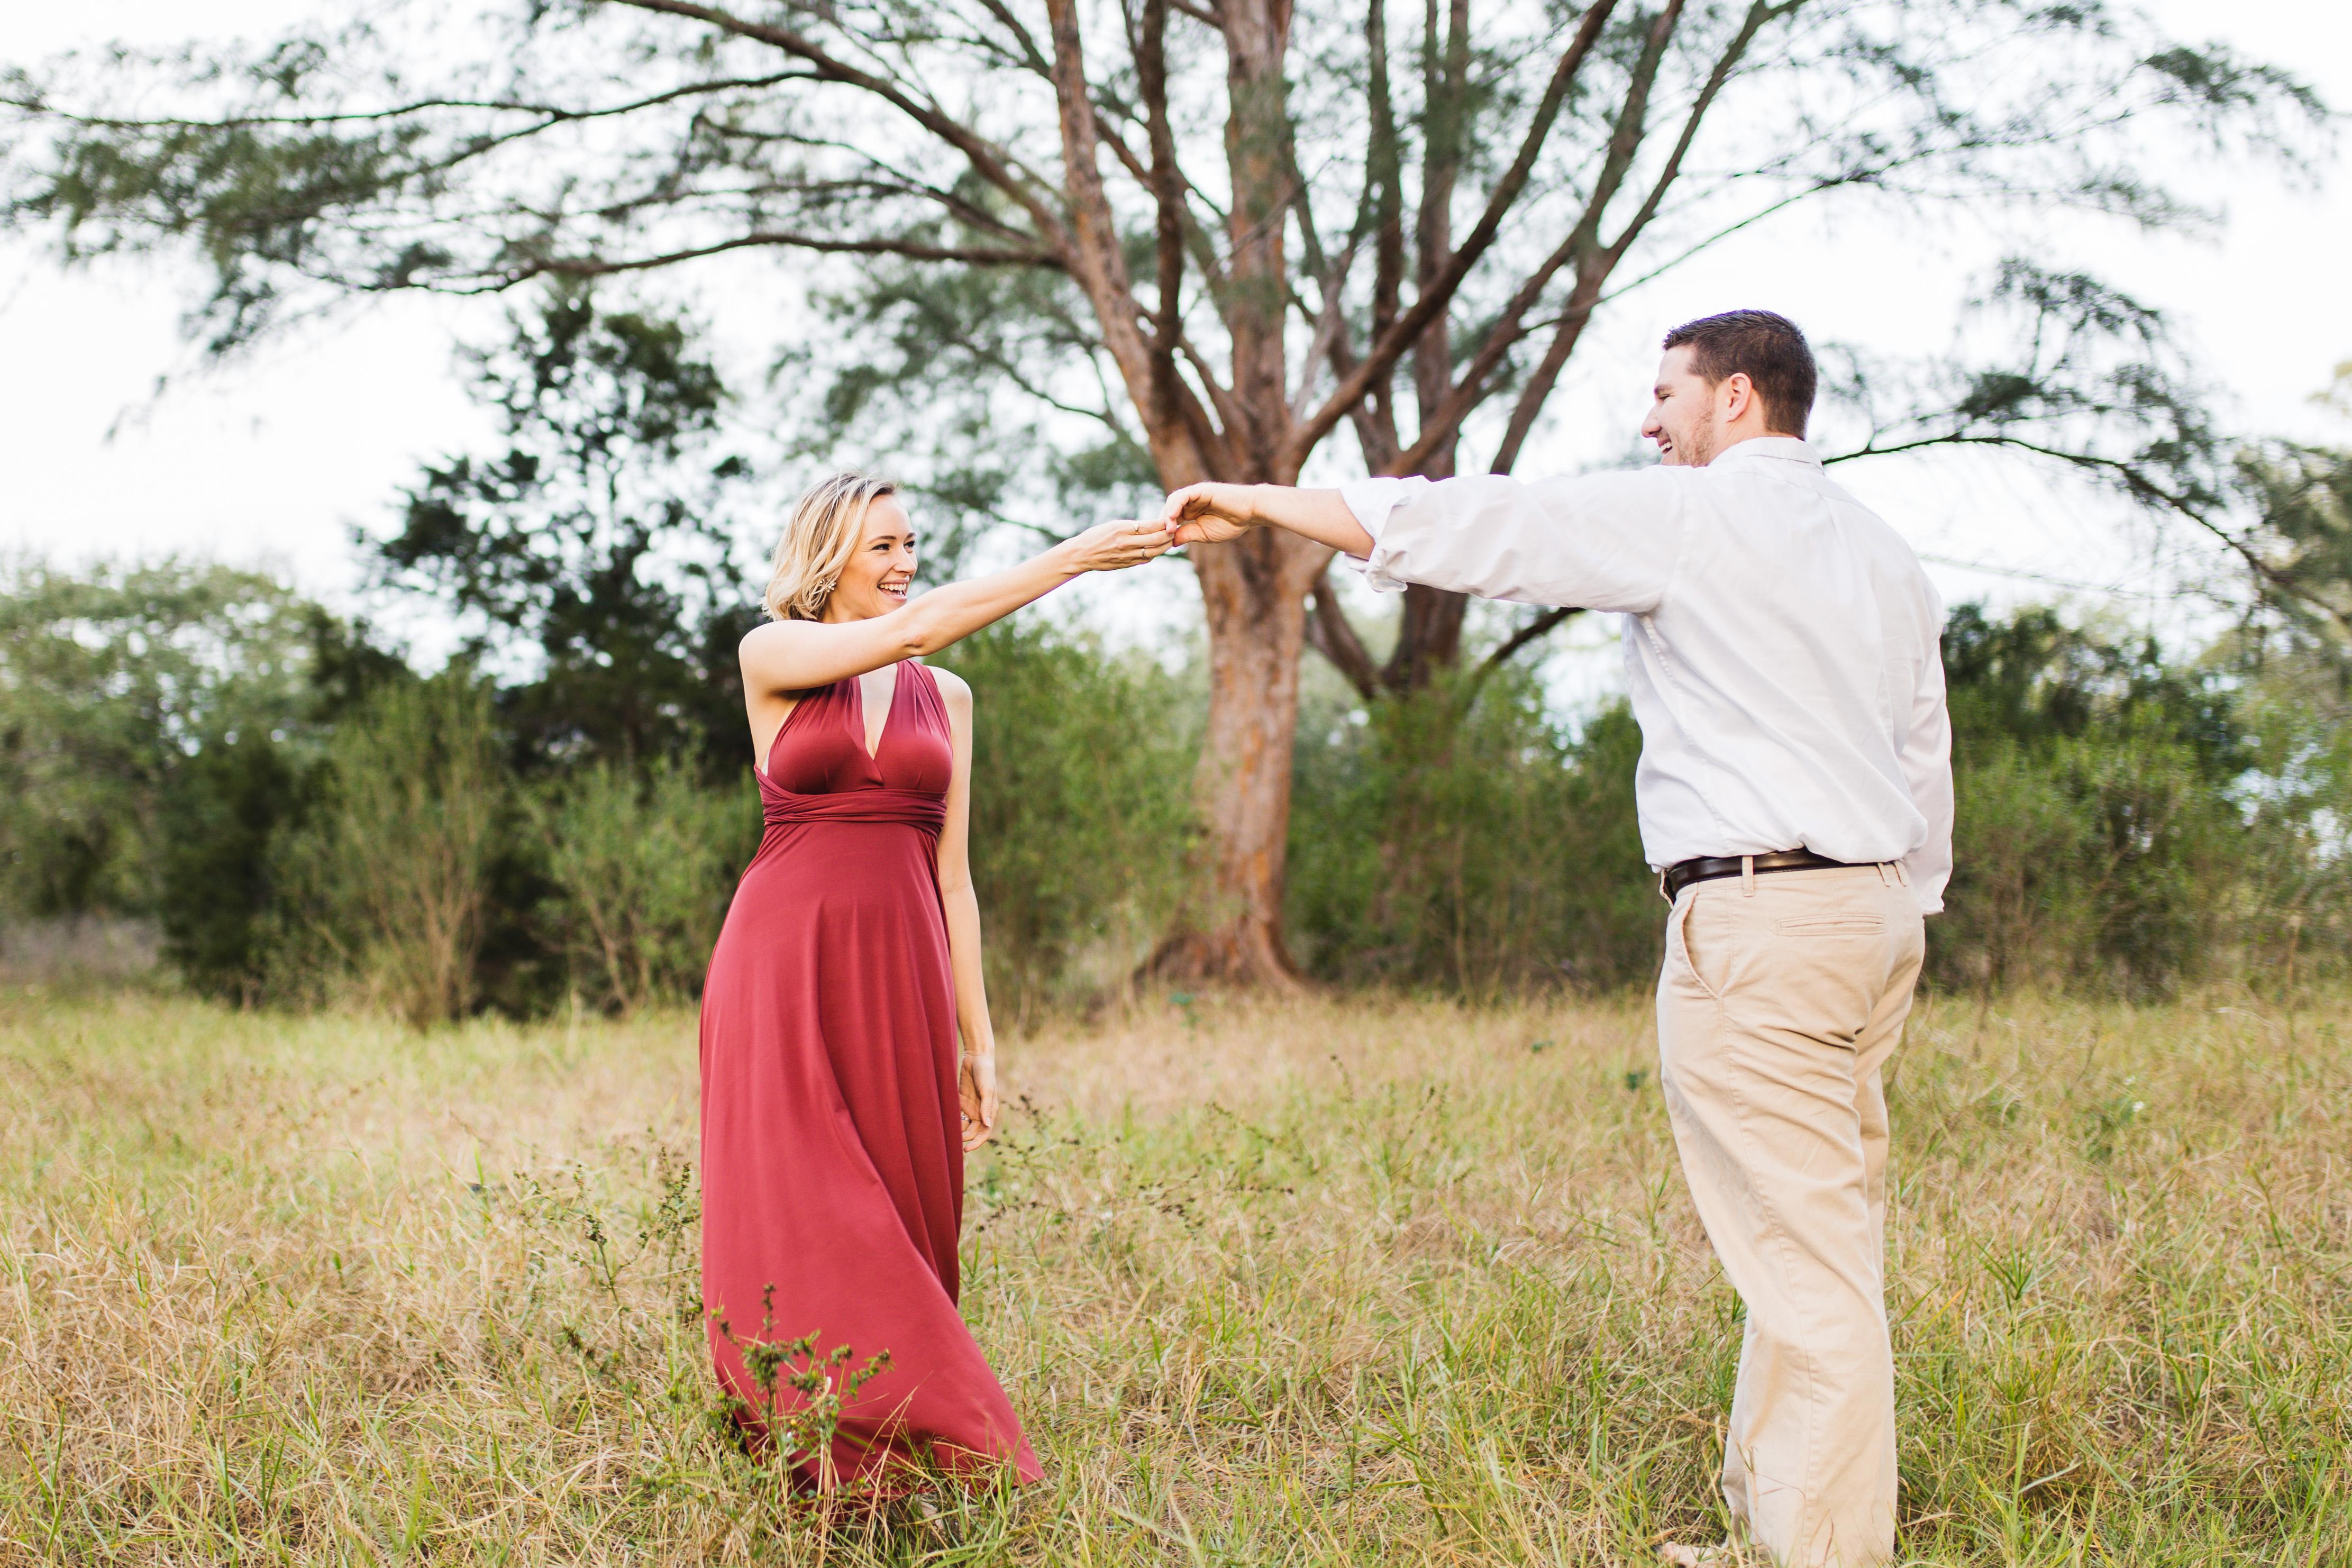 destination-photography-florida-red-dress-romantic-dancing